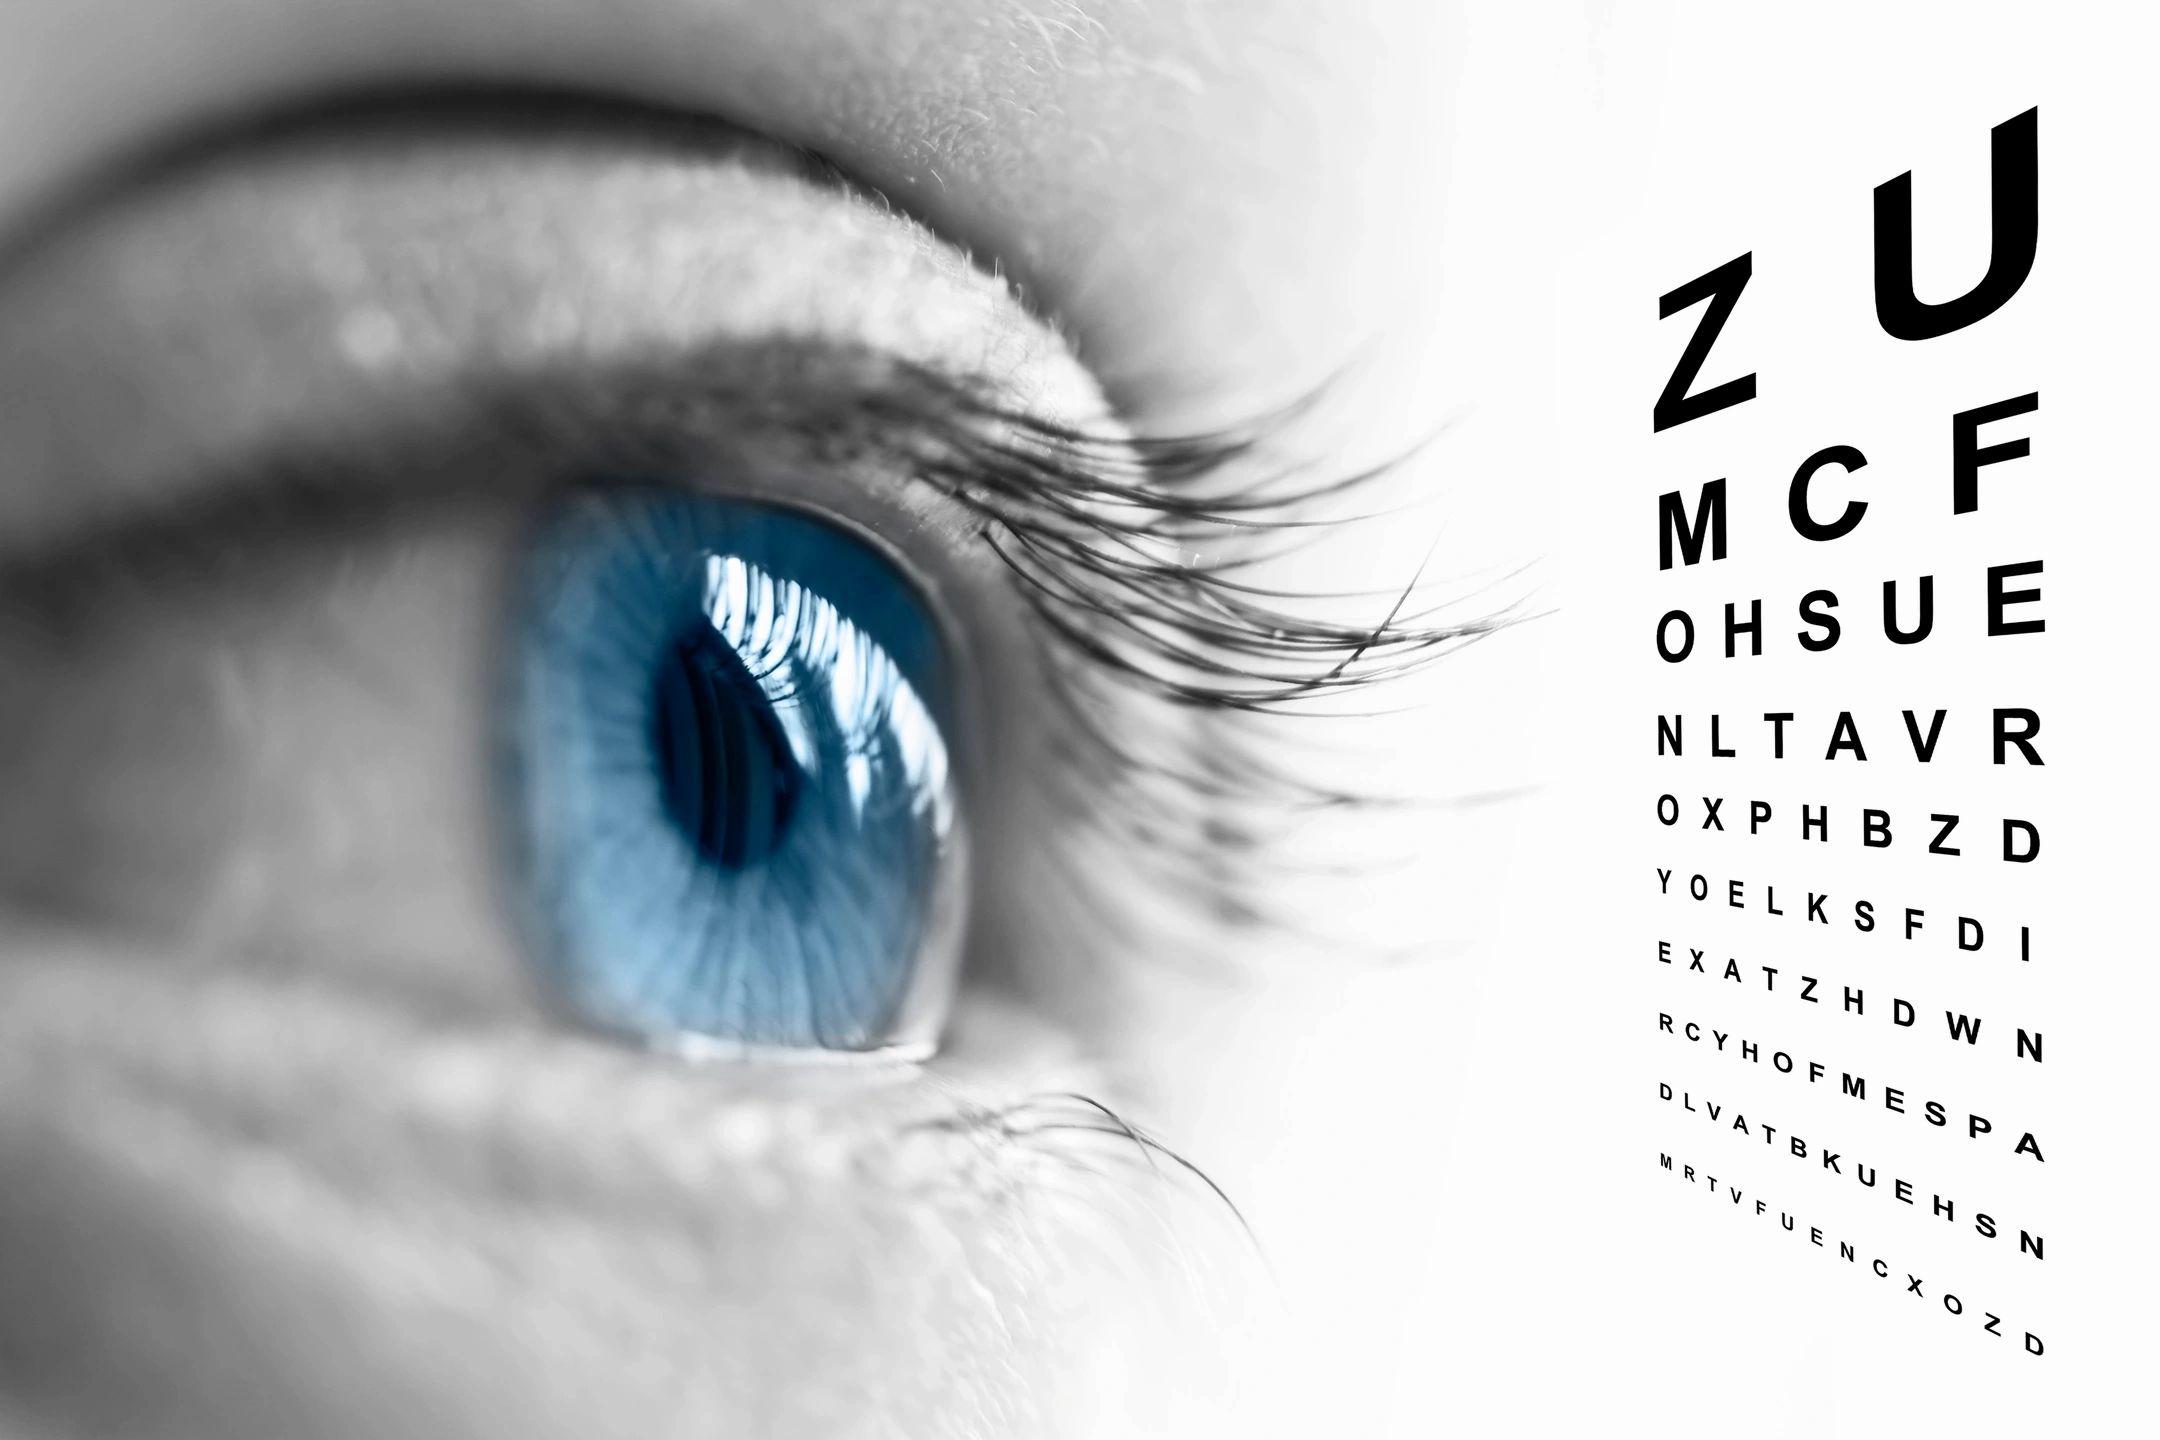 oklahoma eye